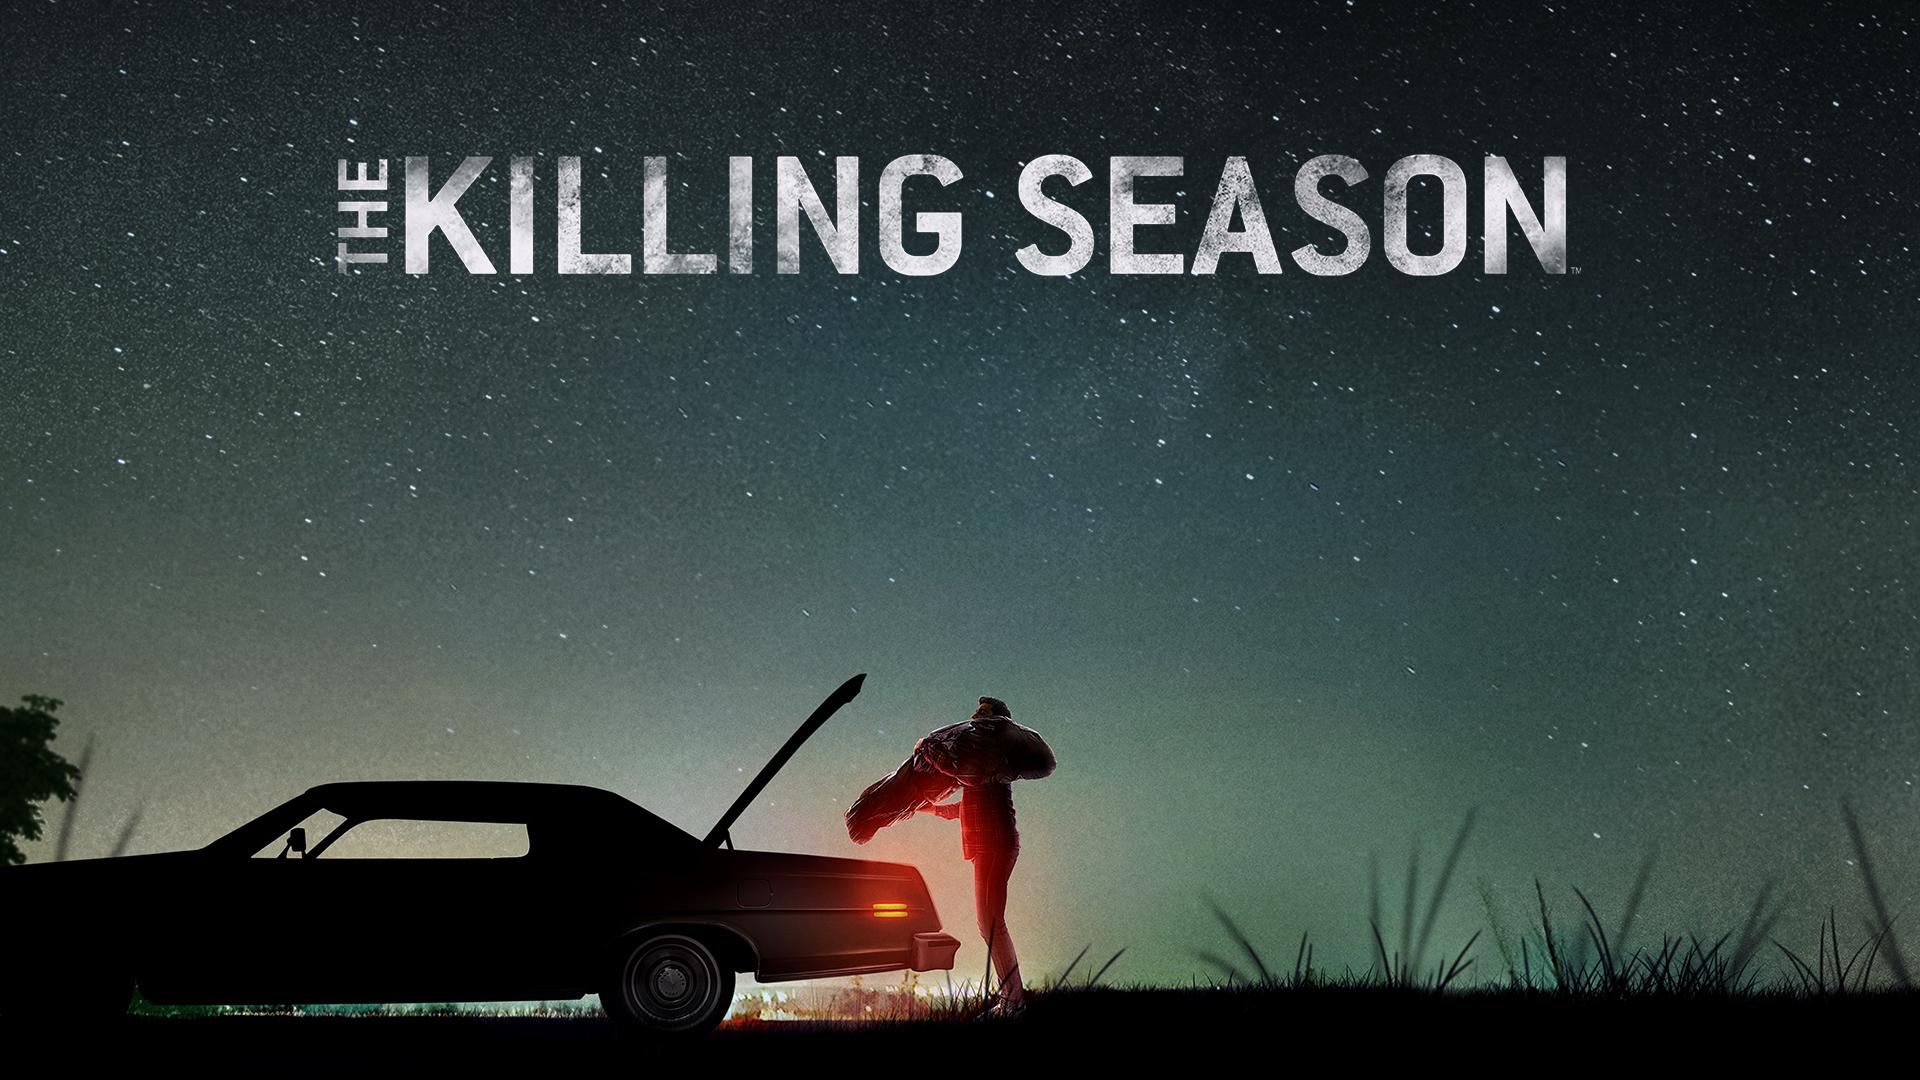 The Killing Season, Season 1